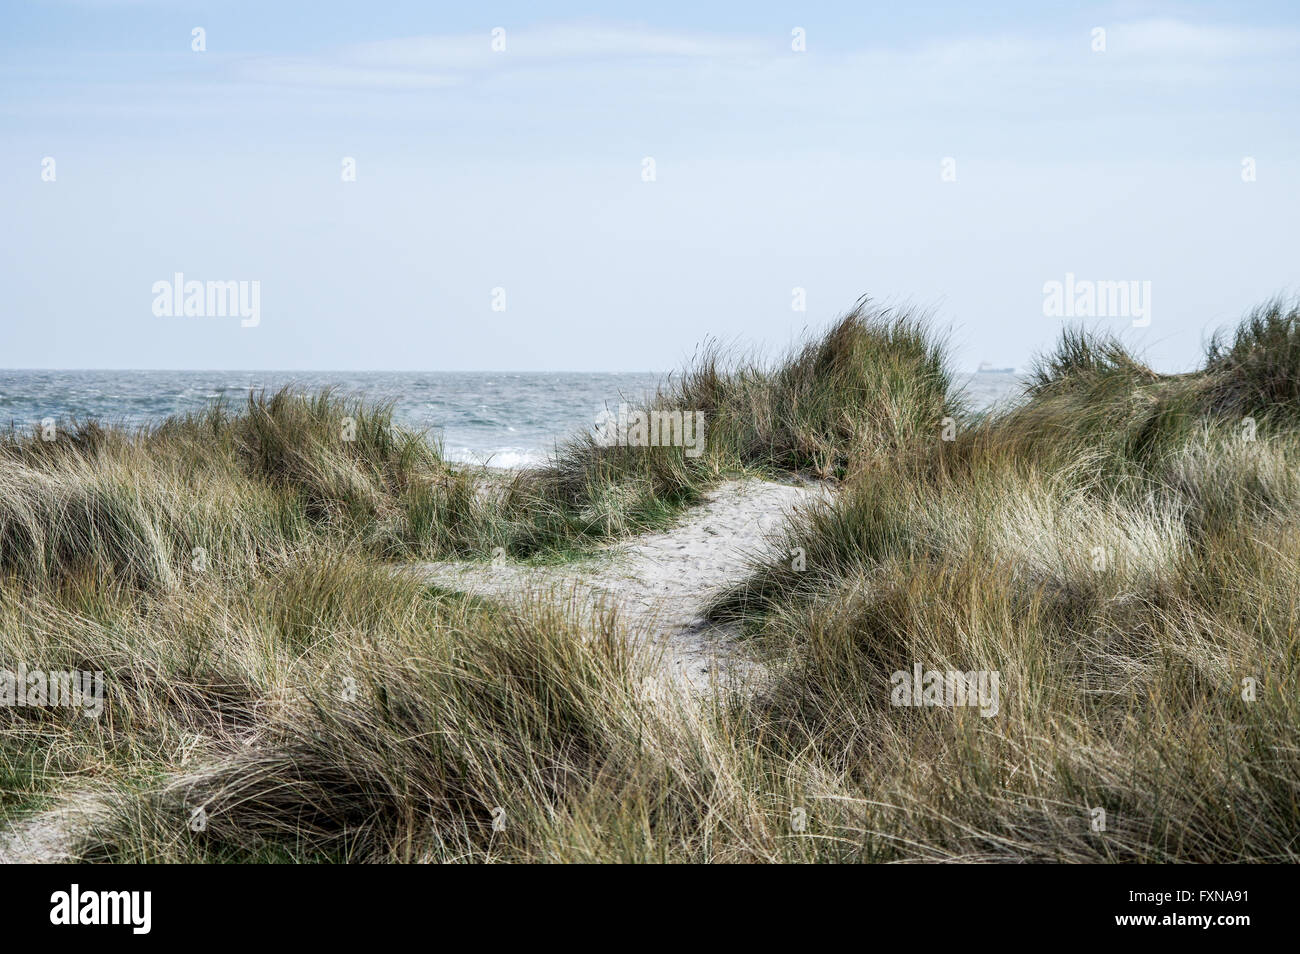 Maram grass growing along Dollymount Strand in Bull Island, Dublin - Stock Image